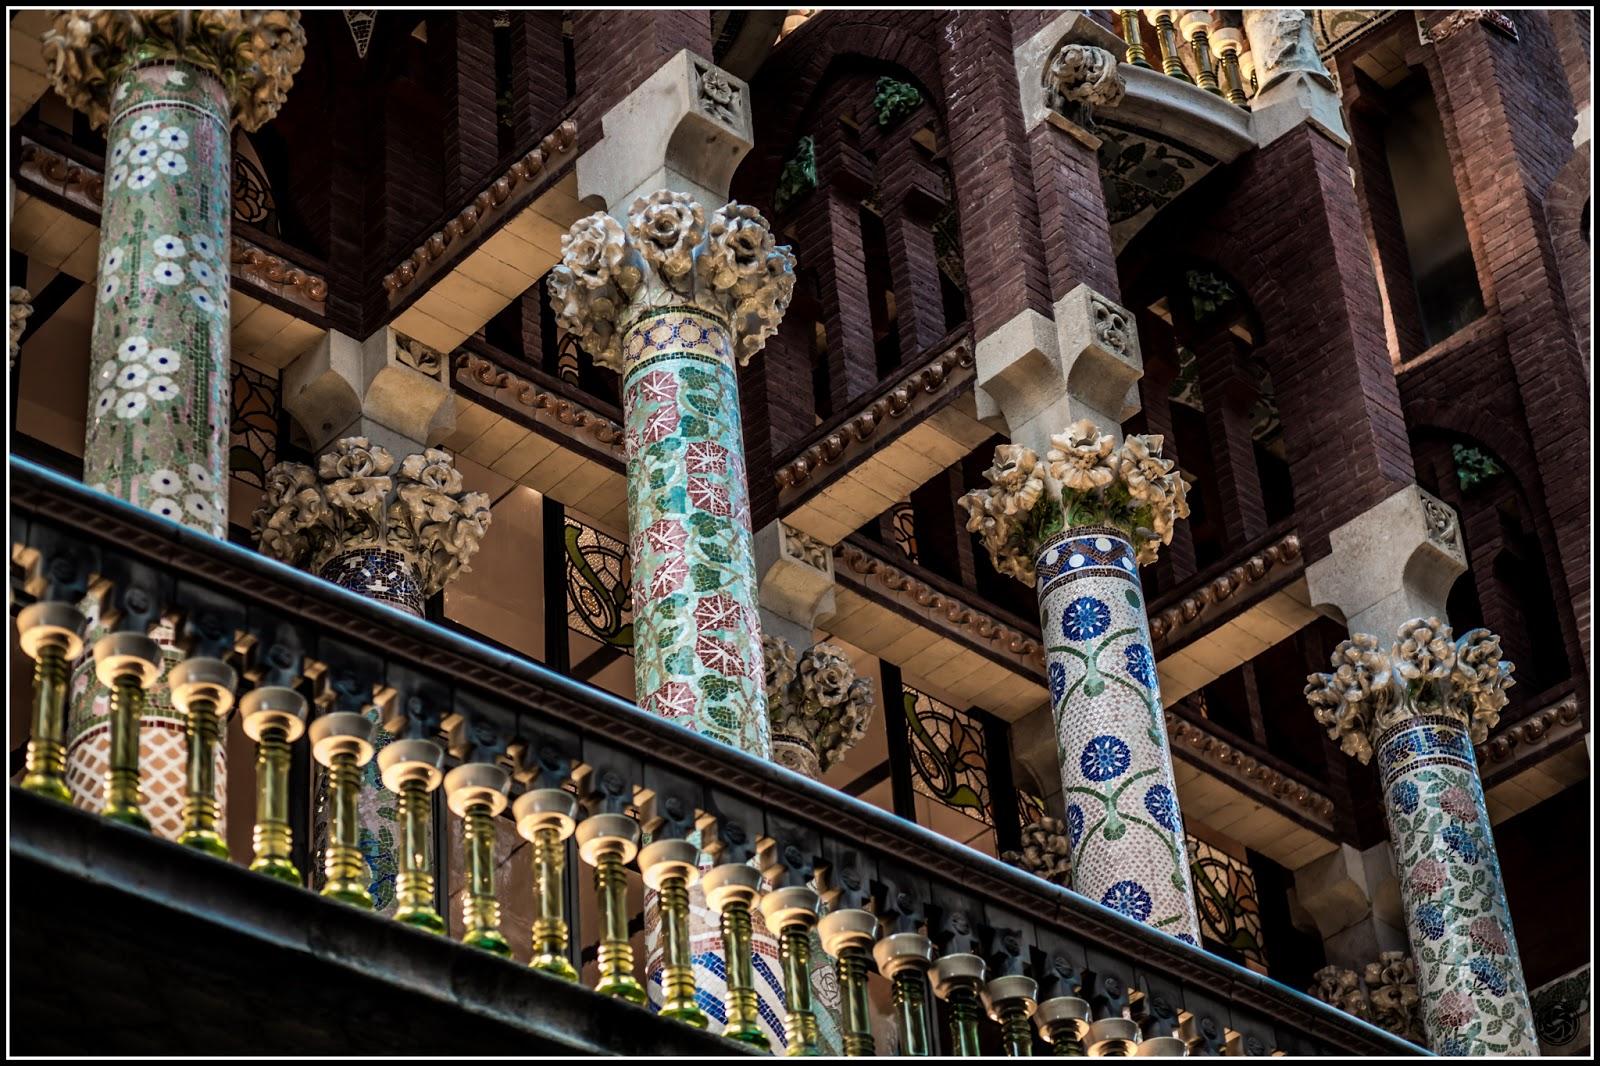 Palau de la Música Catalana :: Canon EOS 5D MkIII | ISO800 | Canon 85mm | f/2.2 | 1/60s